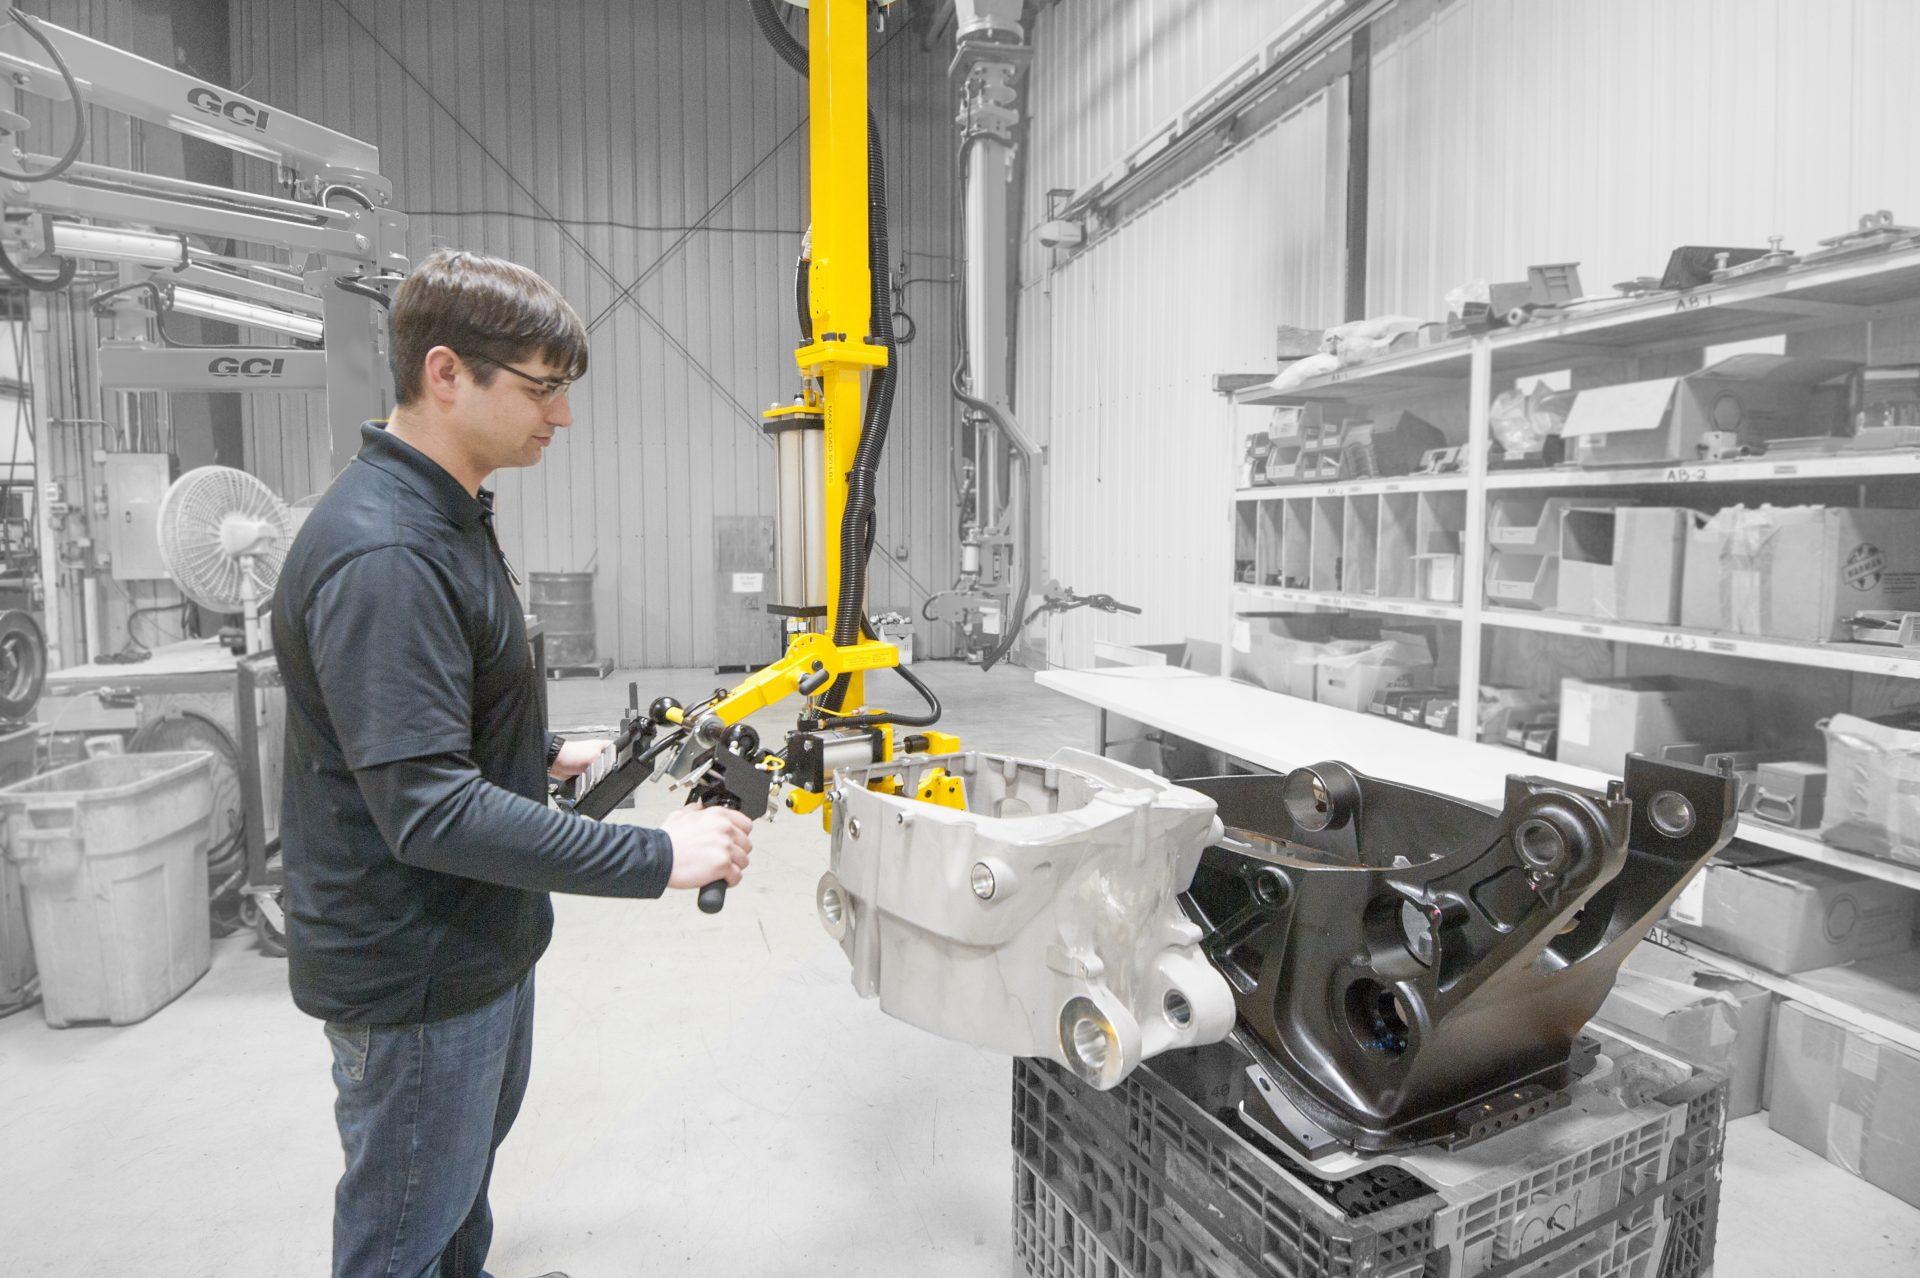 Operator lifts 60 lb engine casting with a GCI manipulator.